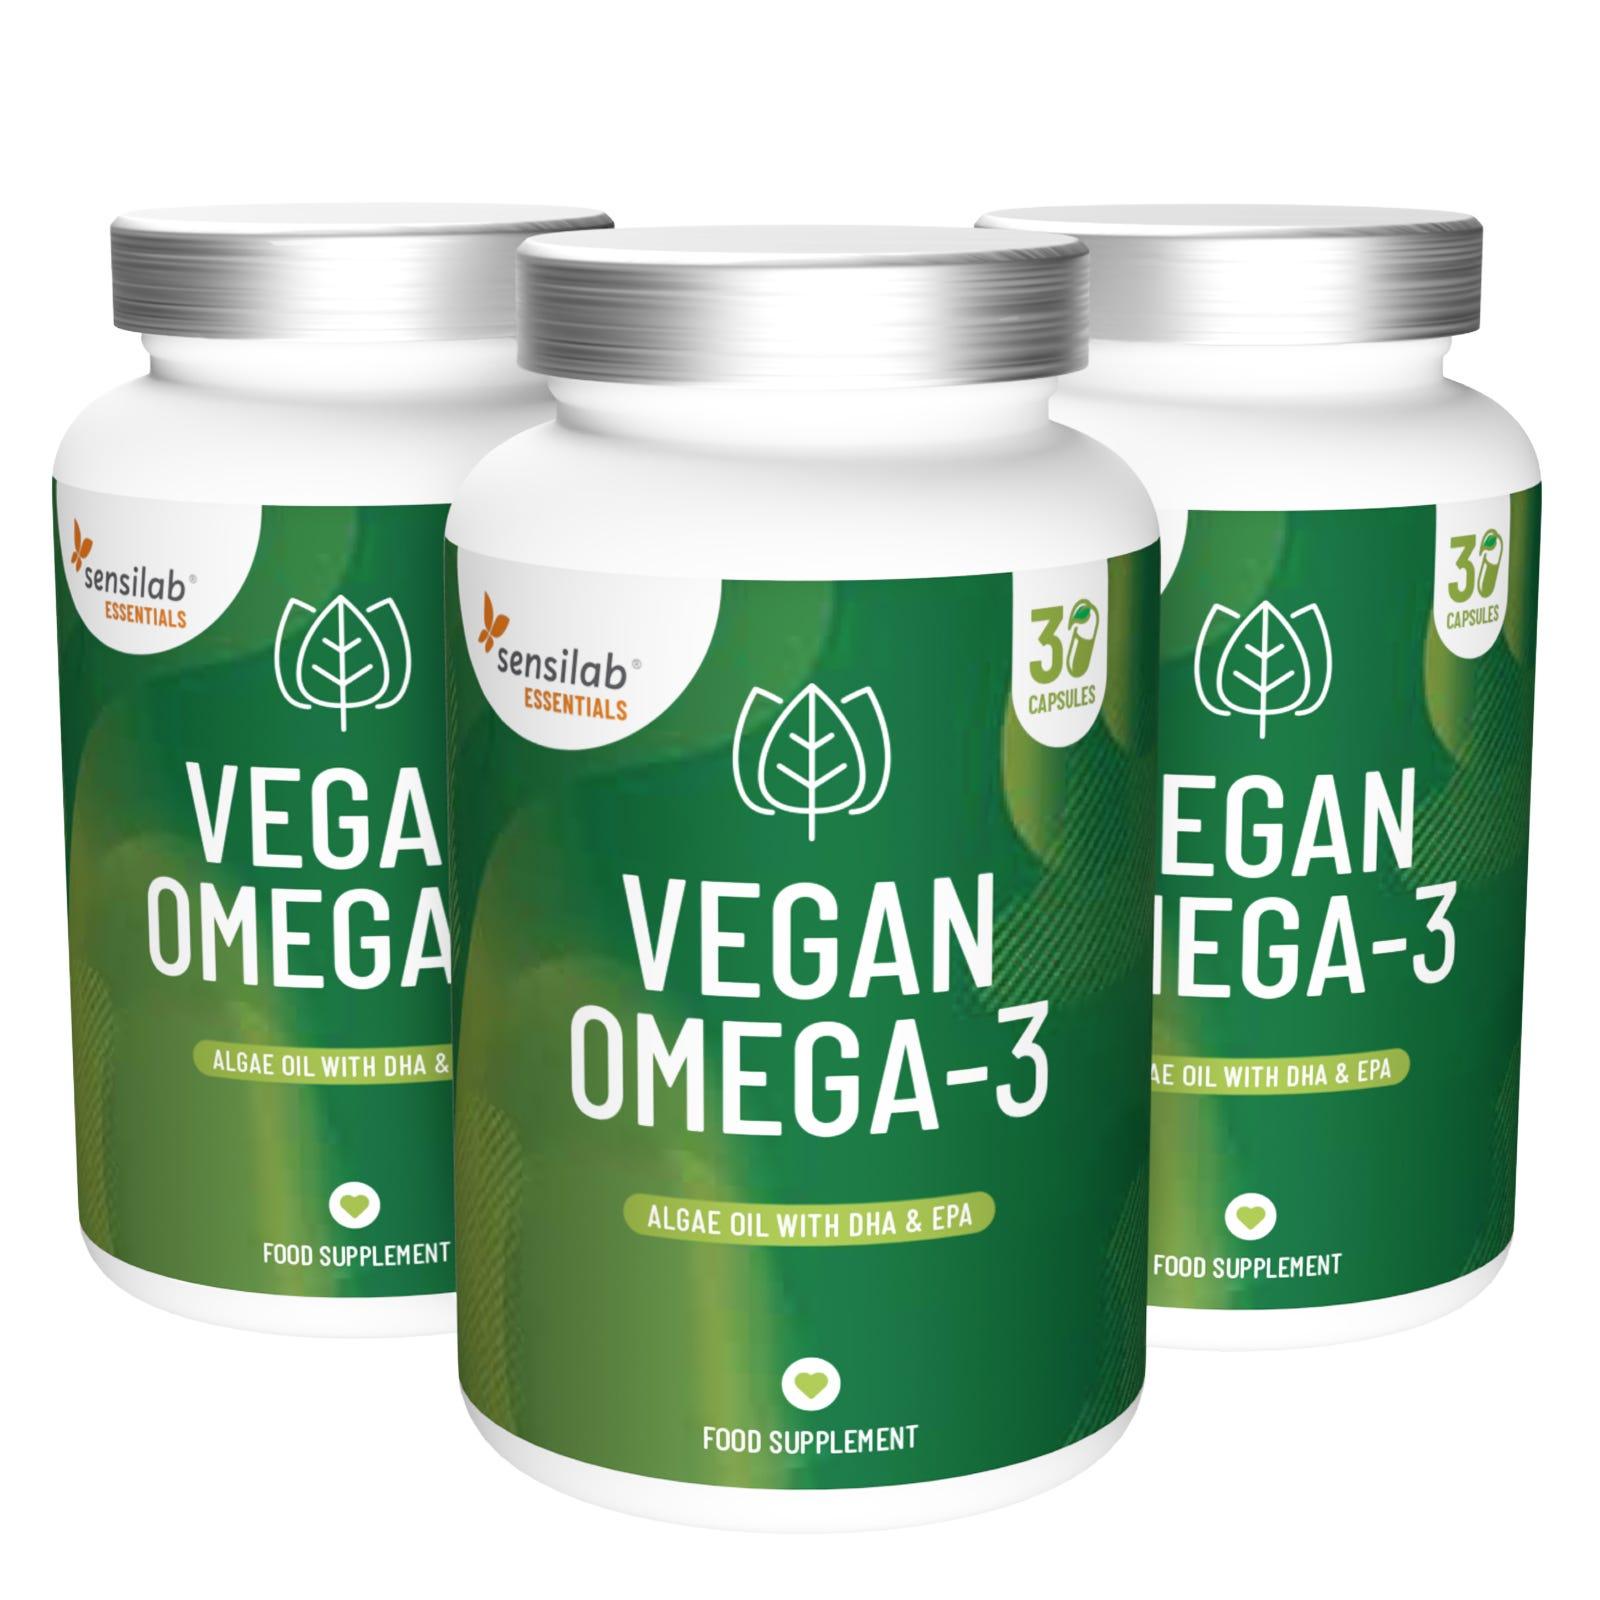 Essentials Vegan Omega-3 Dreierpackung.